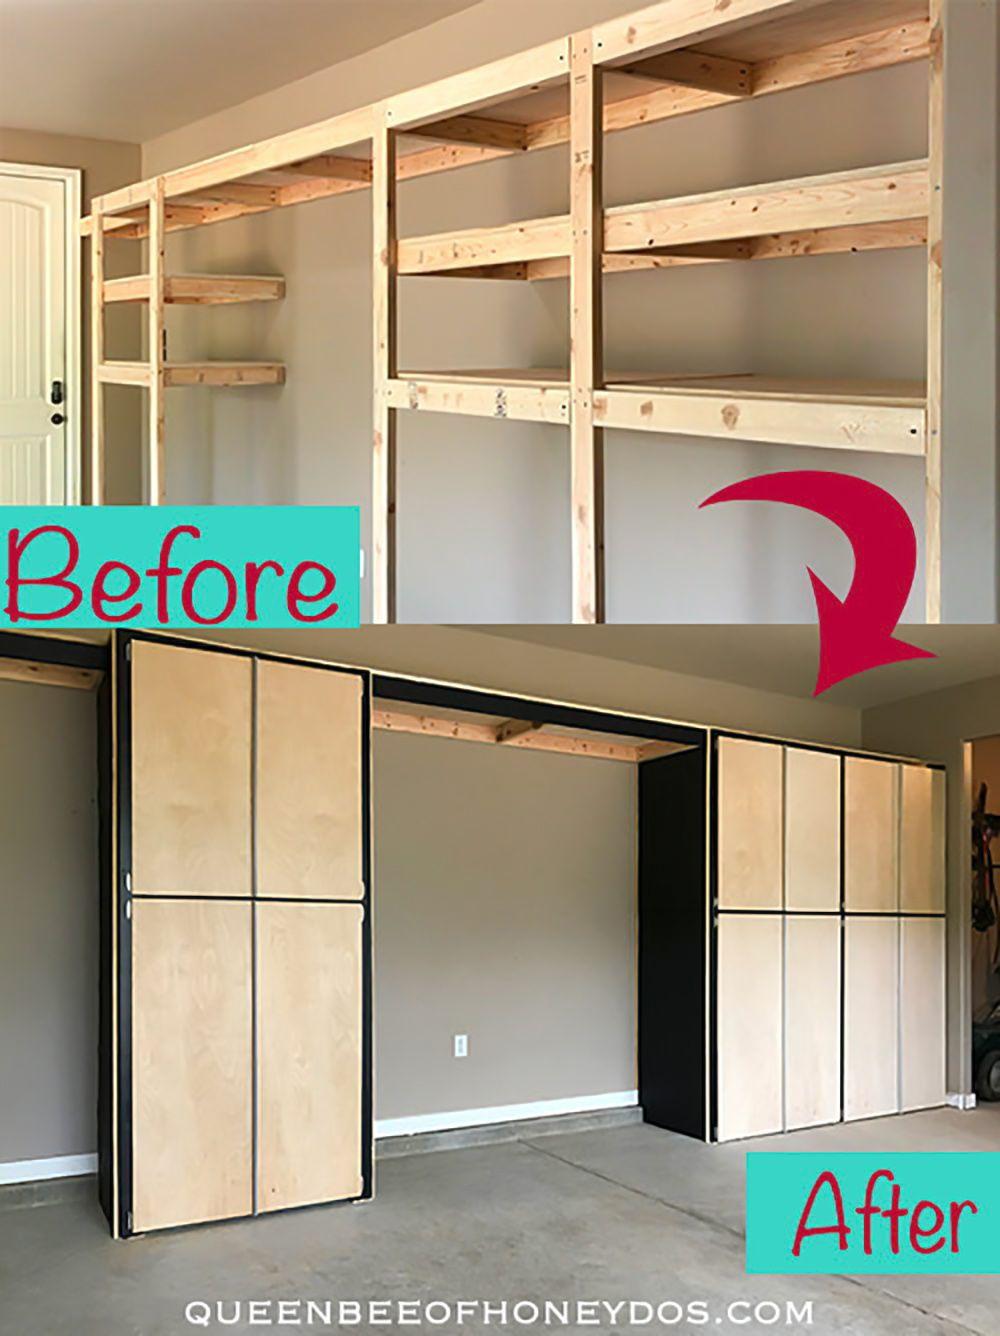 How To Enclose Storage Shelves Queen Bee Of Honey Dos Diy Garage Storage Cabinets Diy Storage Shelves Garage Storage Shelves